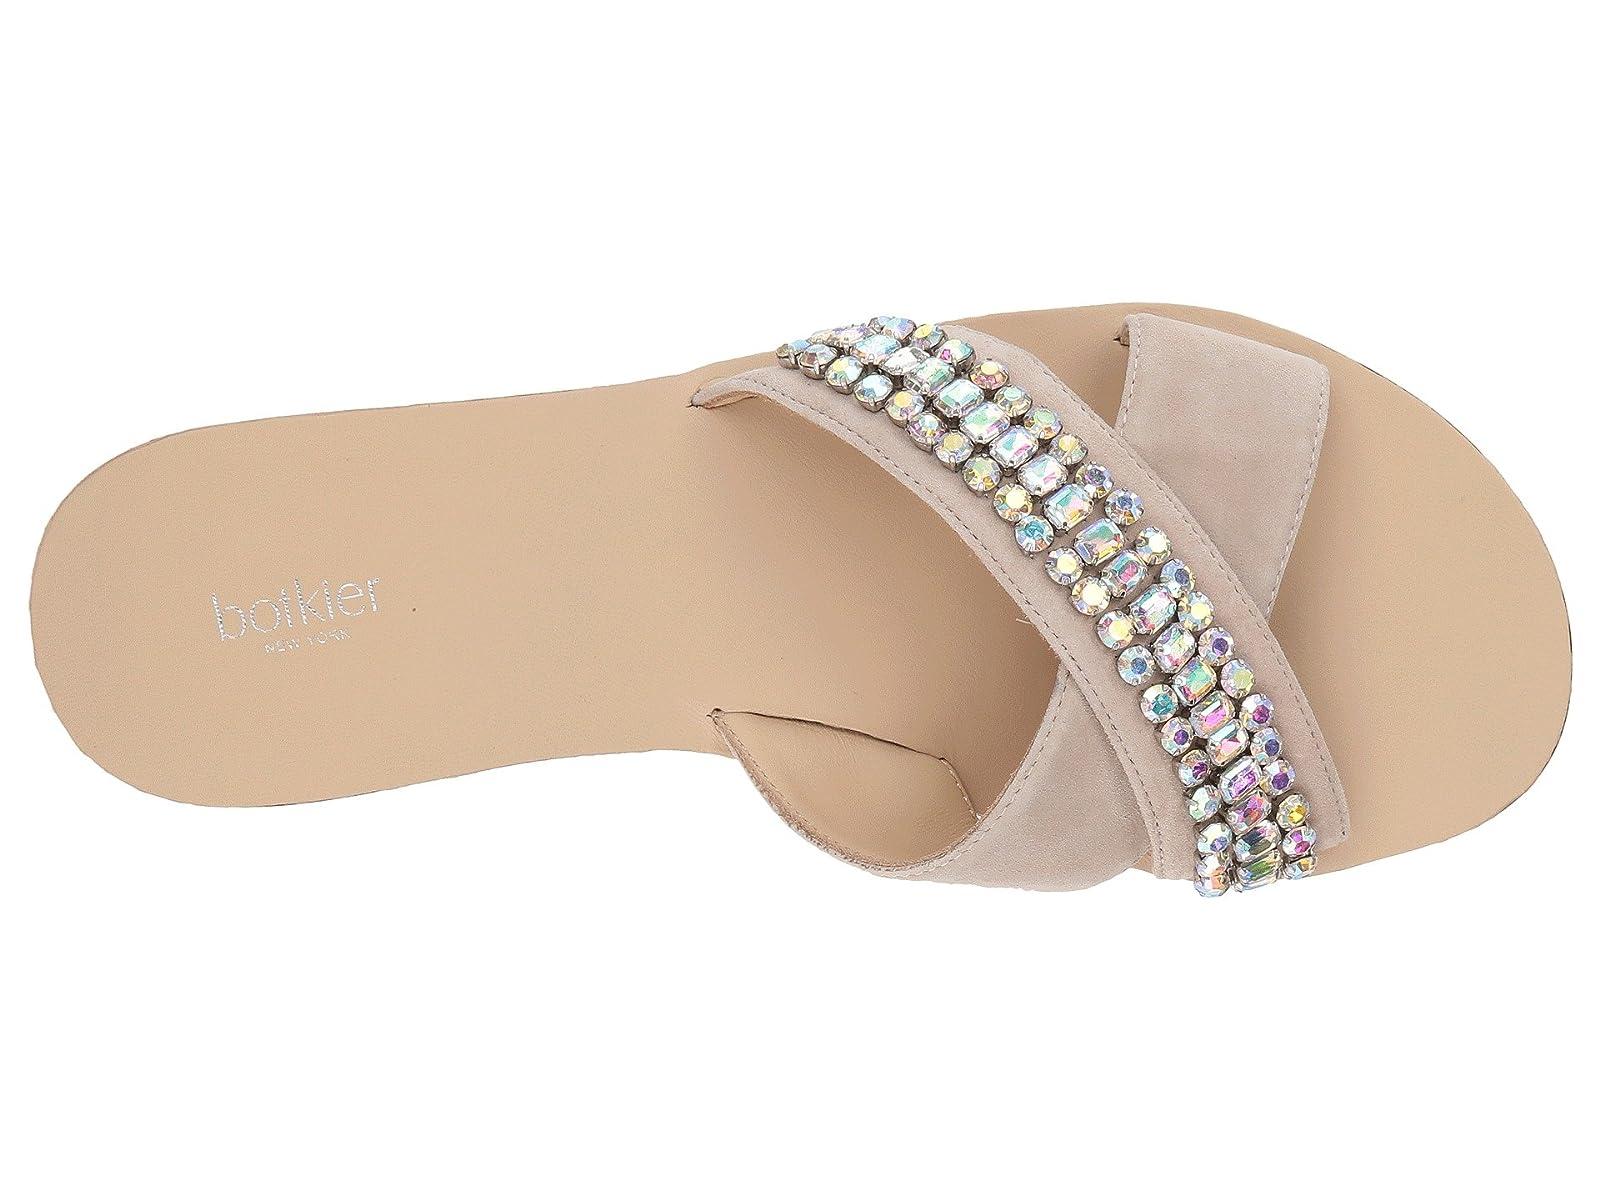 homme / trendy femme · frye ivy glisser · trendy / chaussures bfba7a